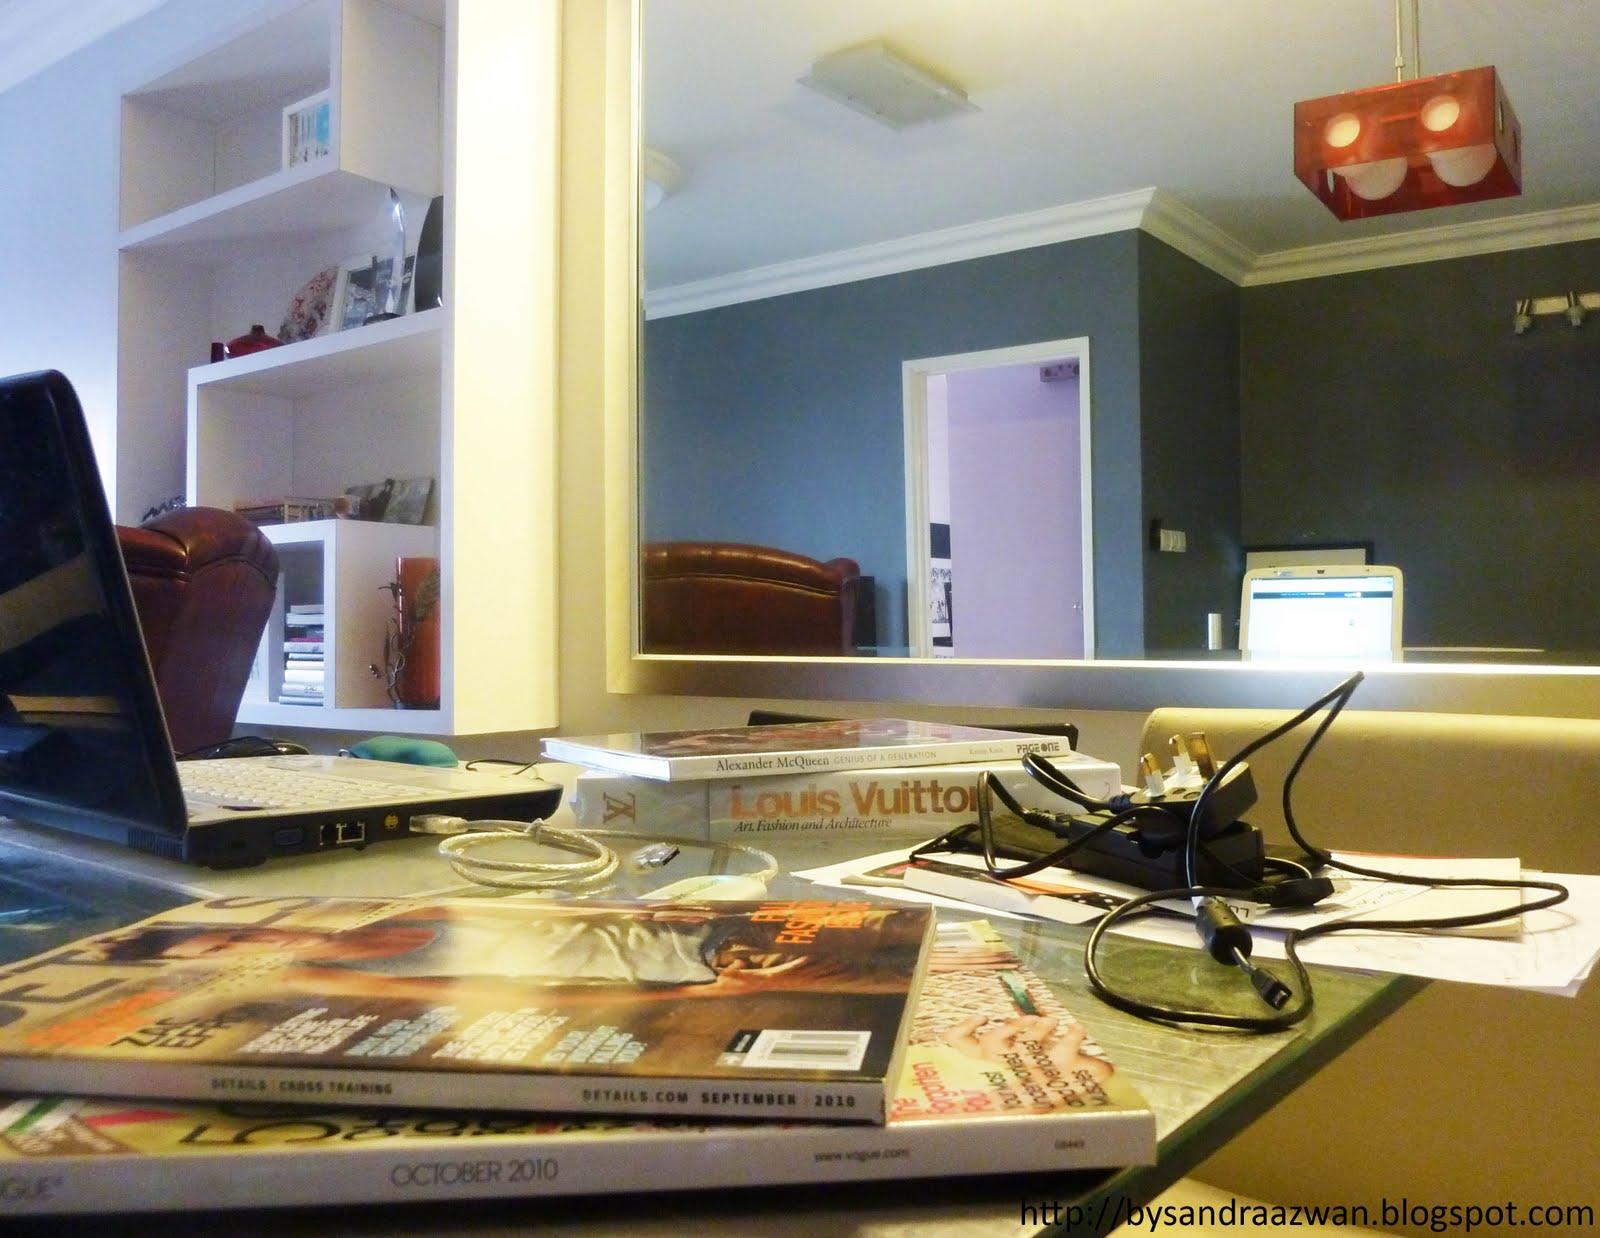 http://3.bp.blogspot.com/-WTzmvPtFSo4/TYB_tEuATvI/AAAAAAAADoc/k0G2w60T8VY/s1600/table%252Bsandra.jpg